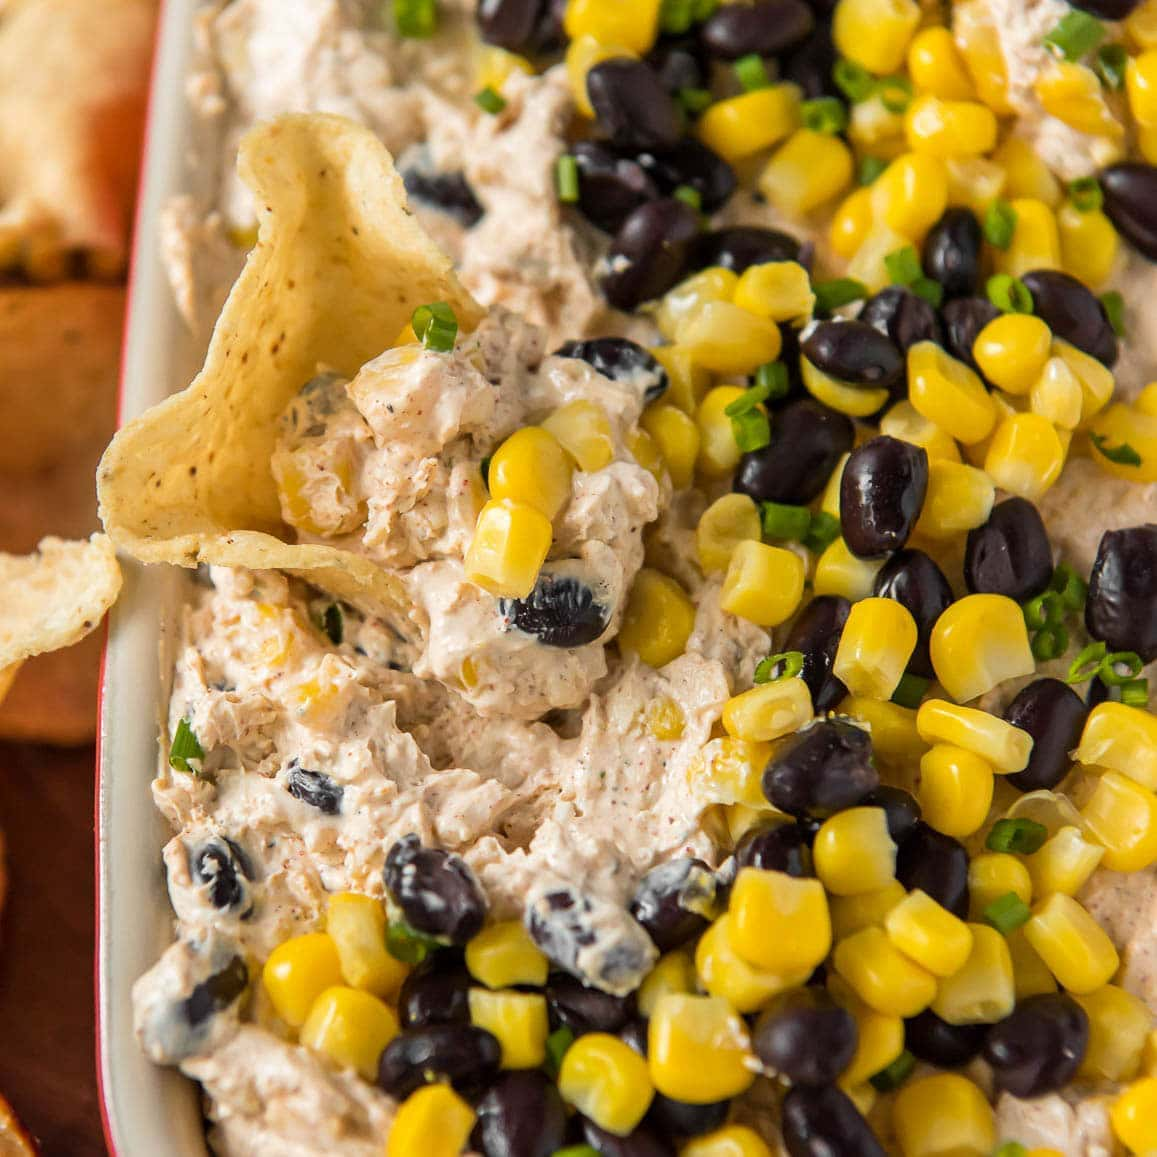 Southwest Ranch Cream Cheese Dip